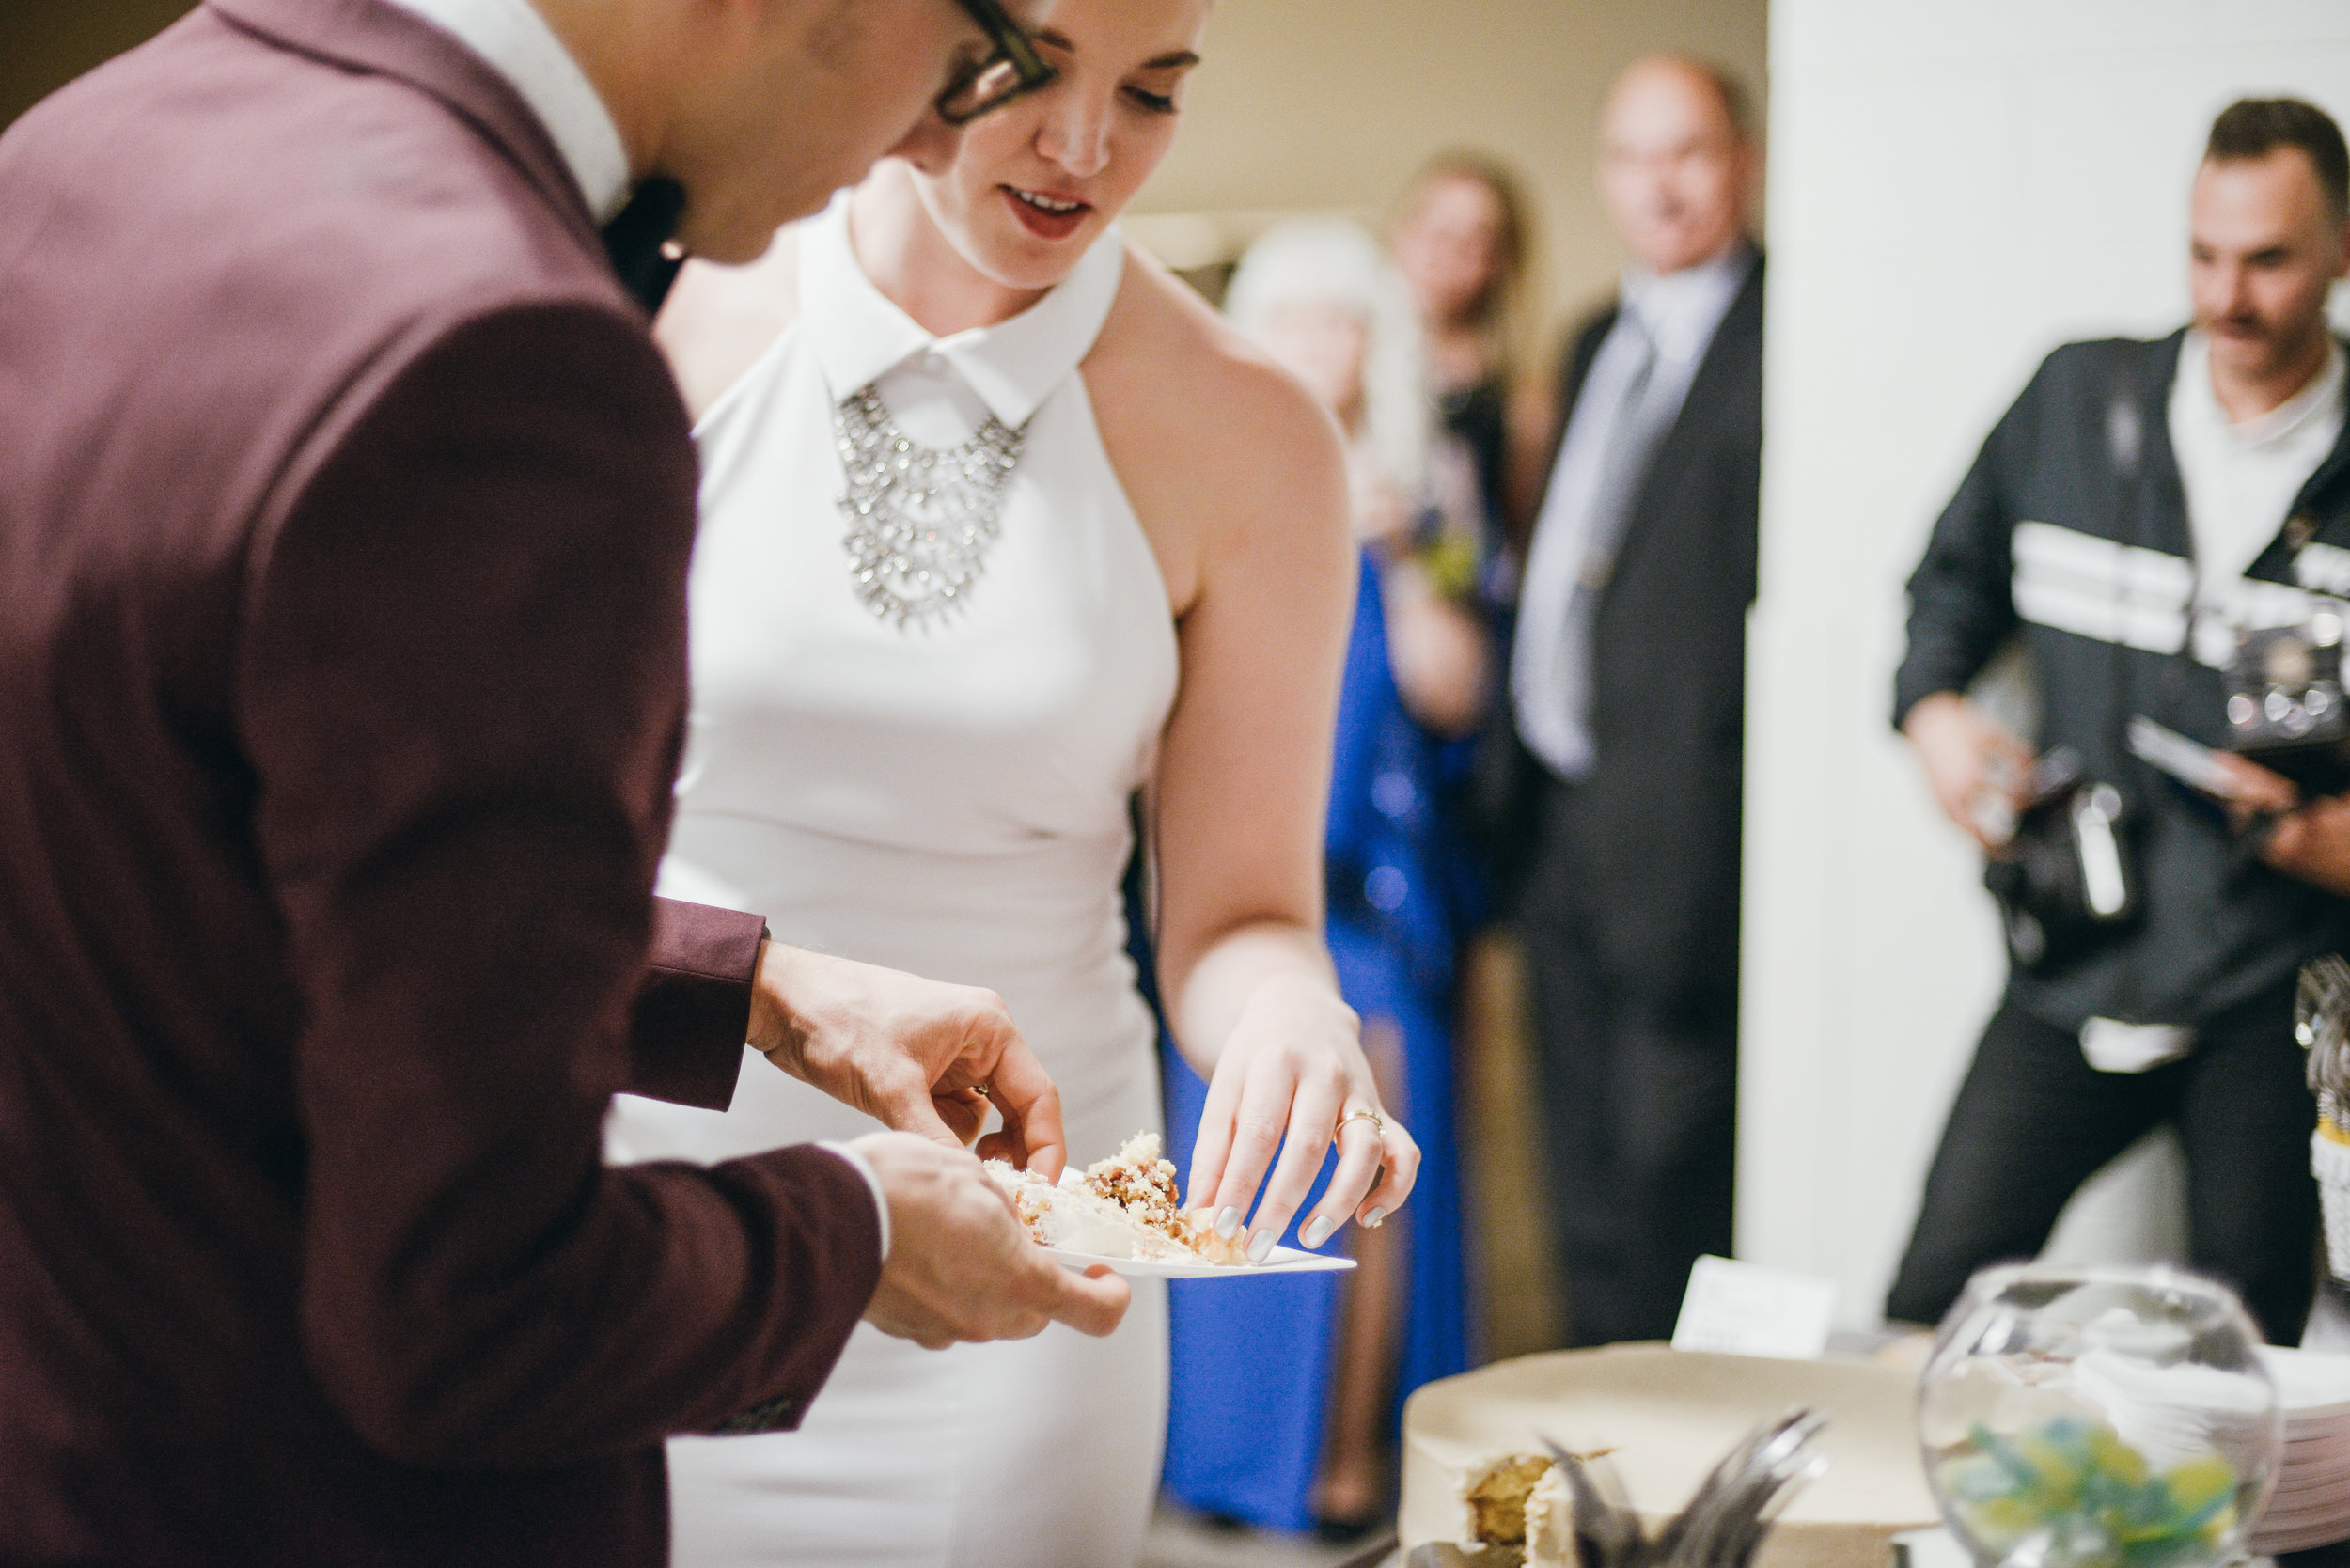 julia-hembree-photography-eden-village-church-wedding-savannah-warehouse-wedding-ivory-and-beau-bridal-boutique-savannah-florist-savannah-wedding-planner-savannah-event-design-scad-wedding-artist-wedding-savannah-funky-wedding-handmade-wedding-73.jpg